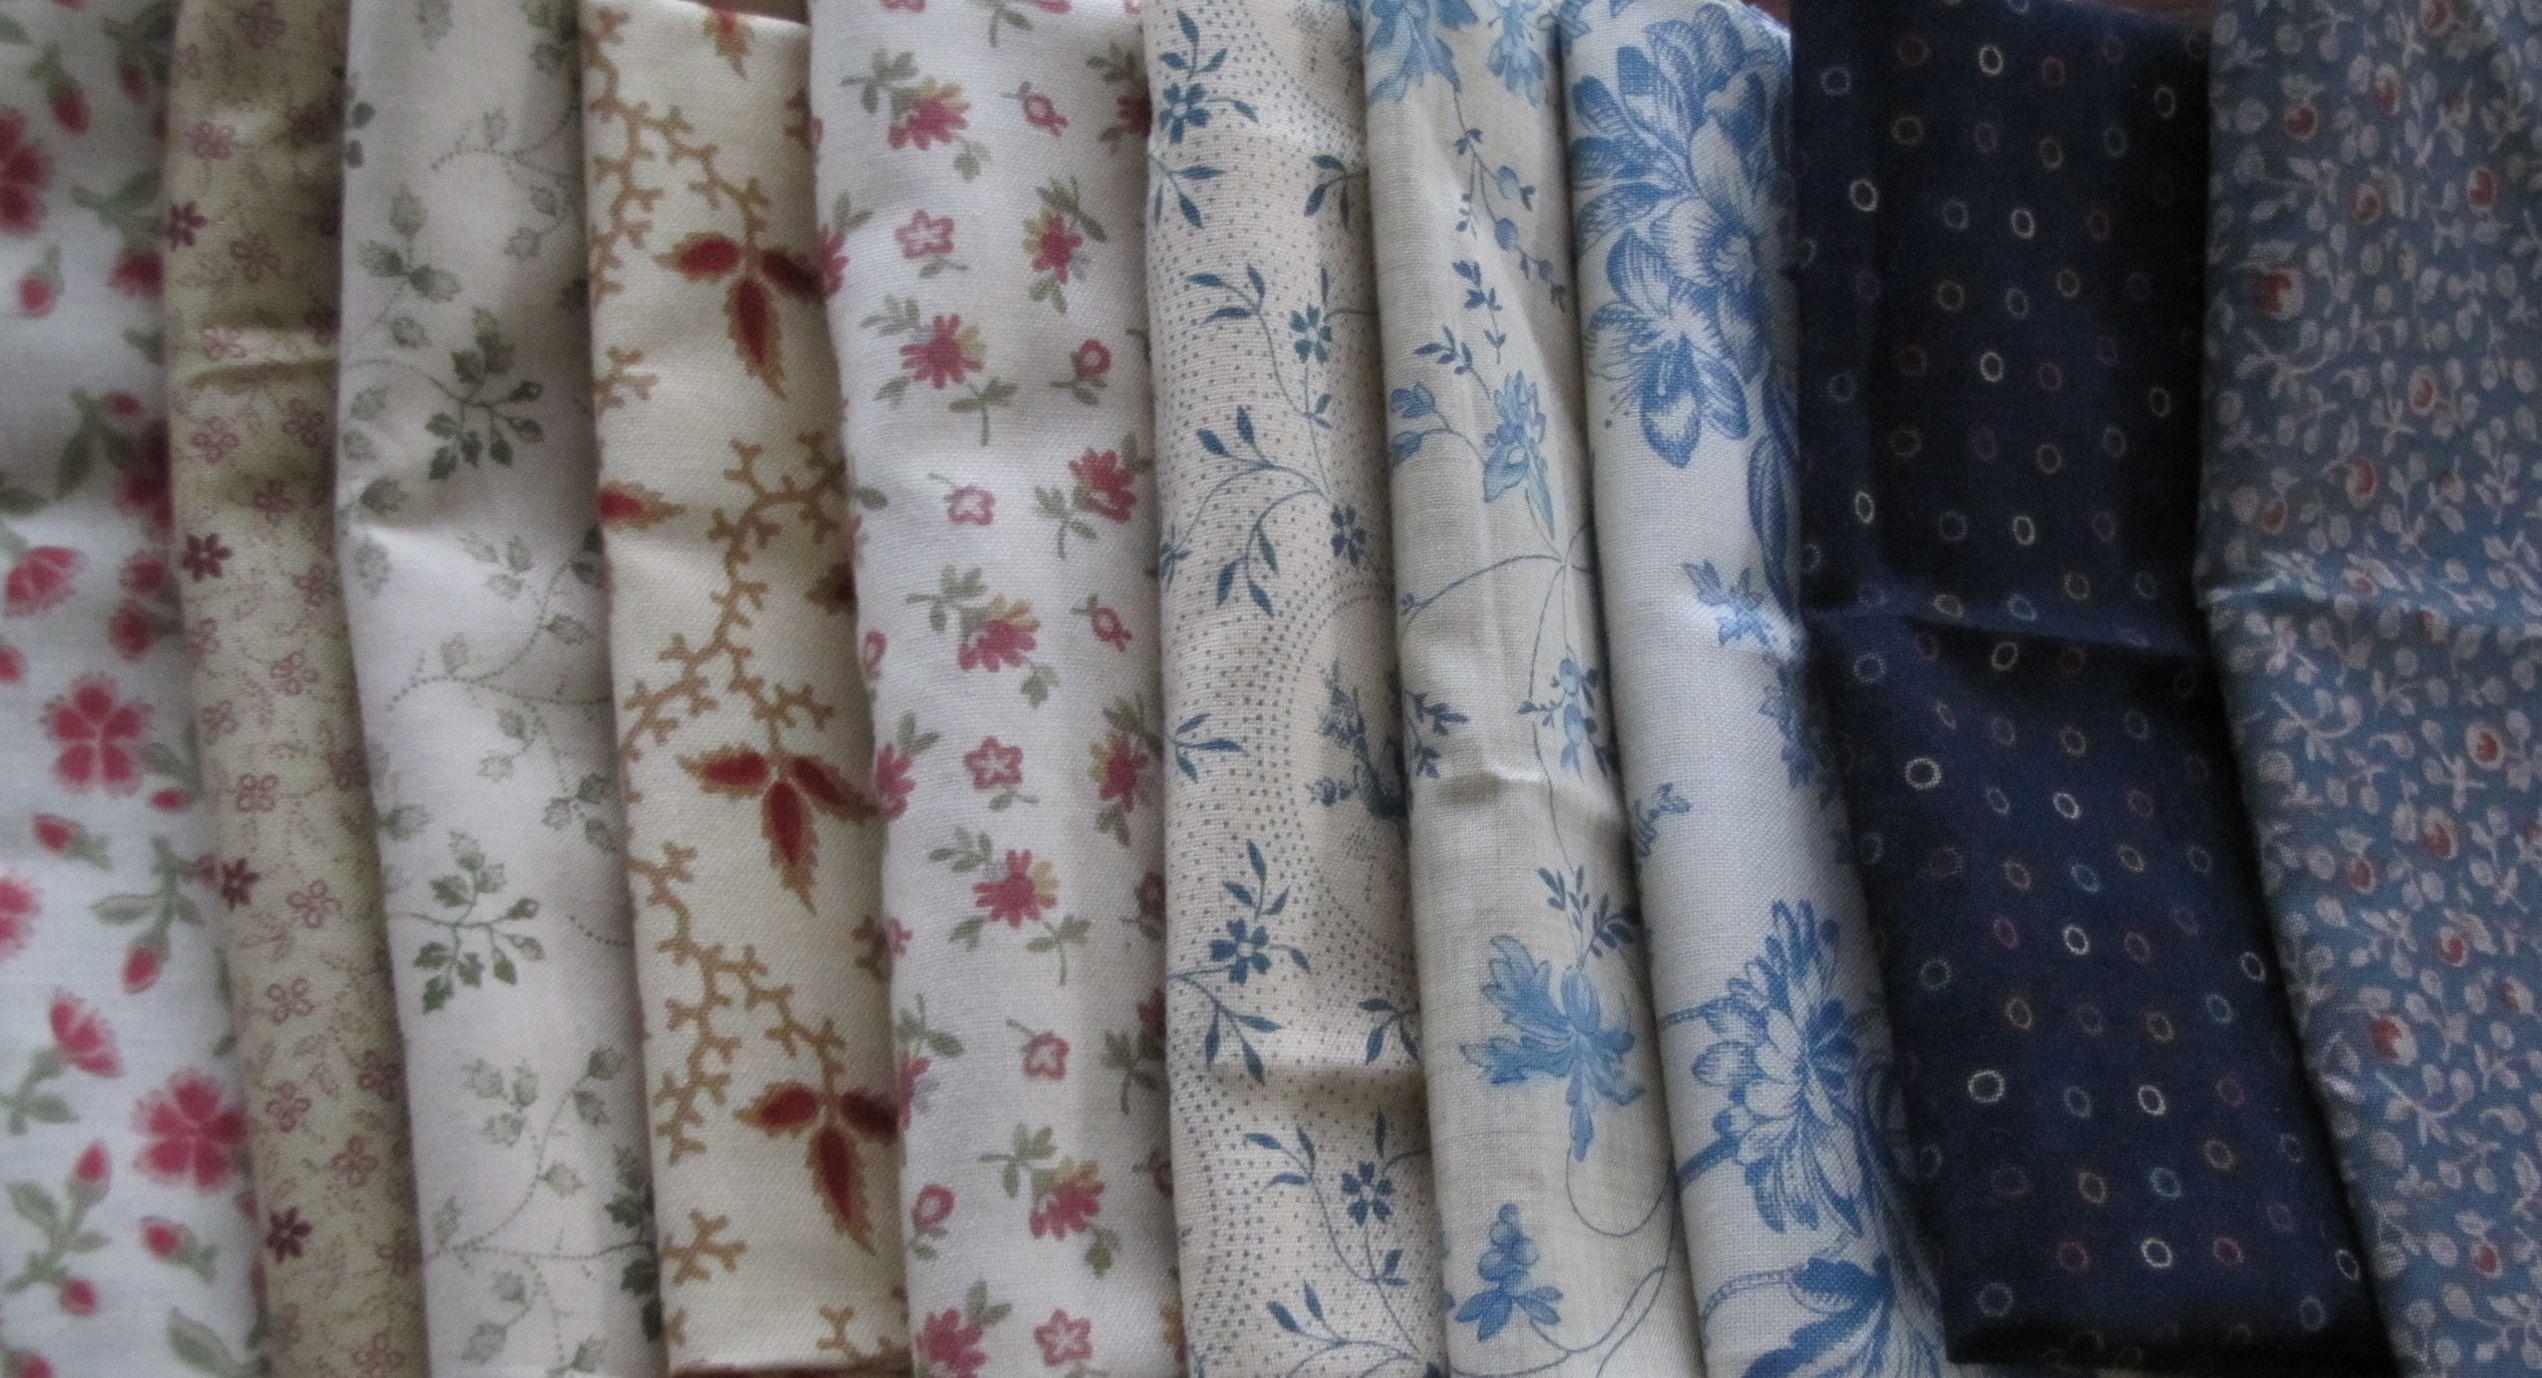 and more fabrics